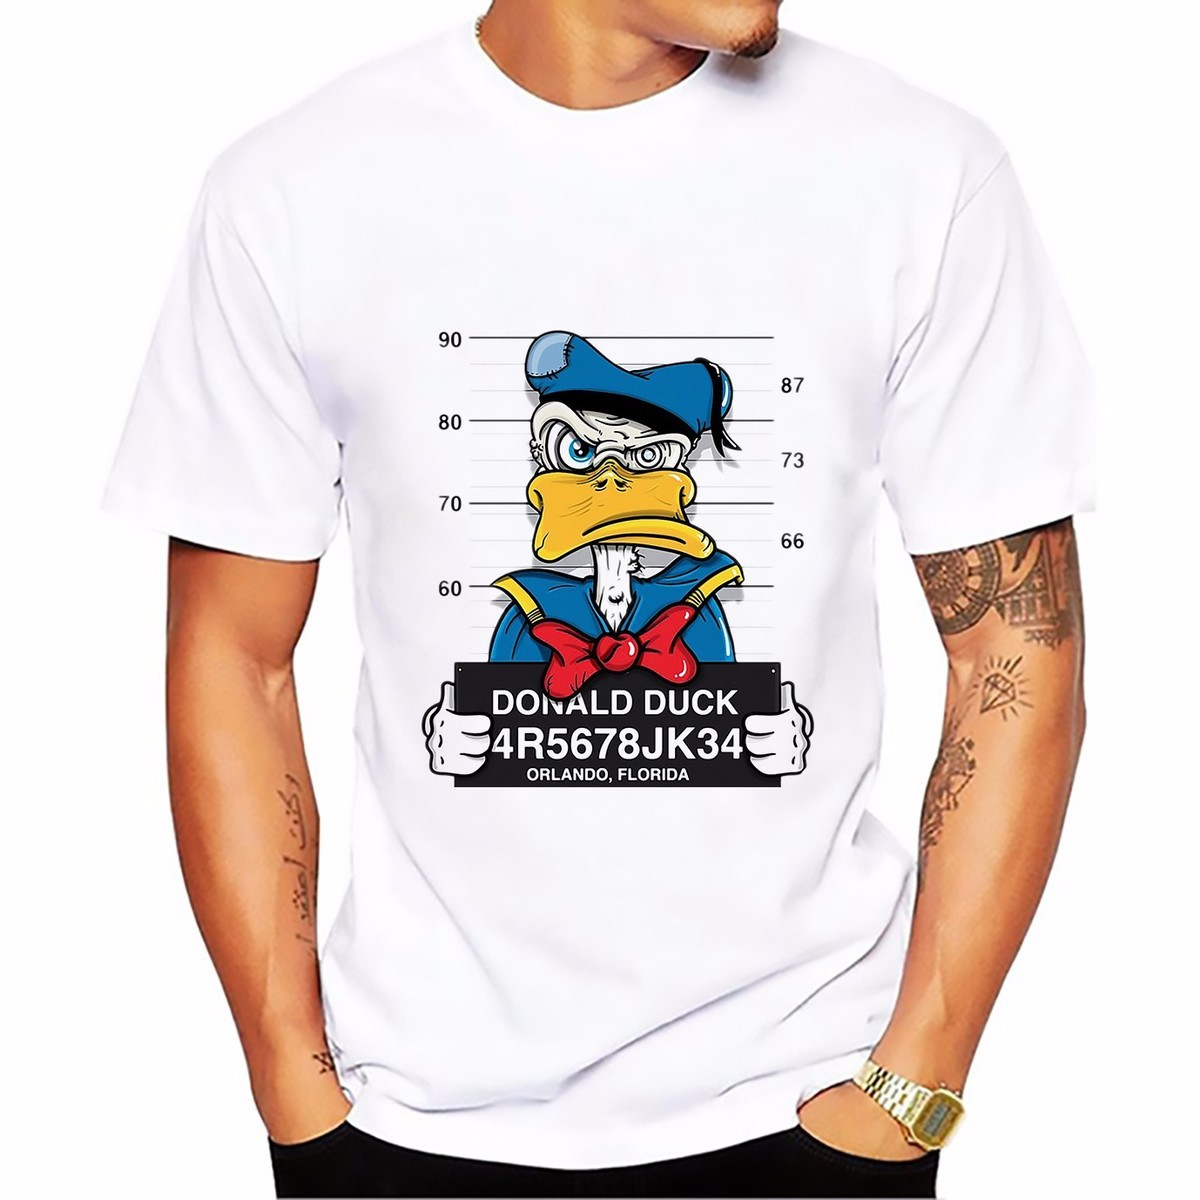 2018 T Shirt women tops Short Sleeve Casual funny cartoon dog mouse Donald Duck Bad Guys T Shirt Femme women Tops tee plue size